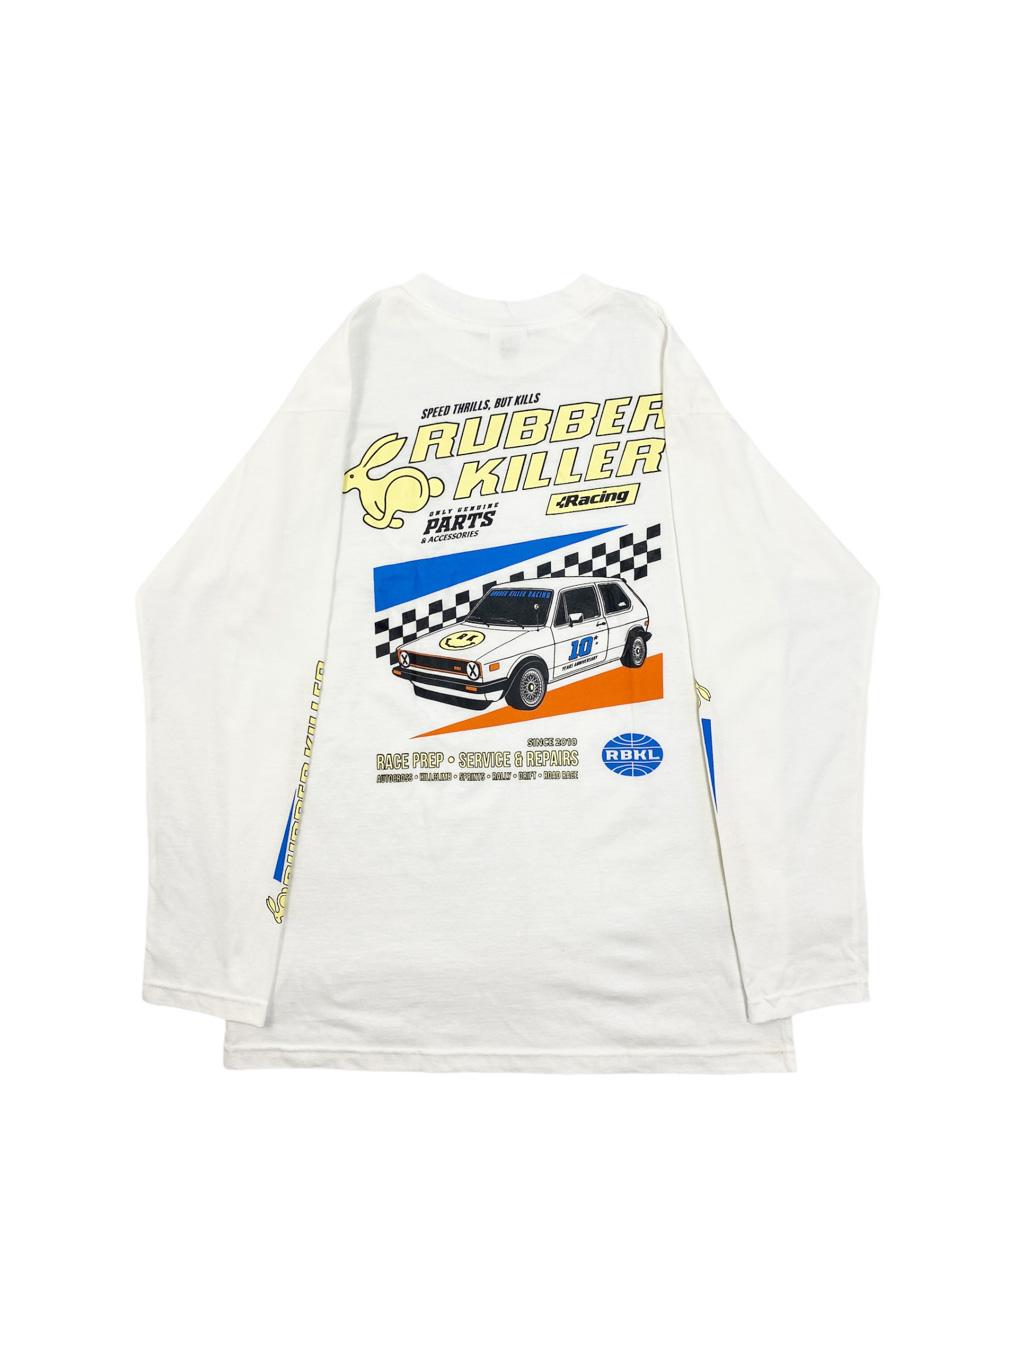 RK Racing Service Tee (White)